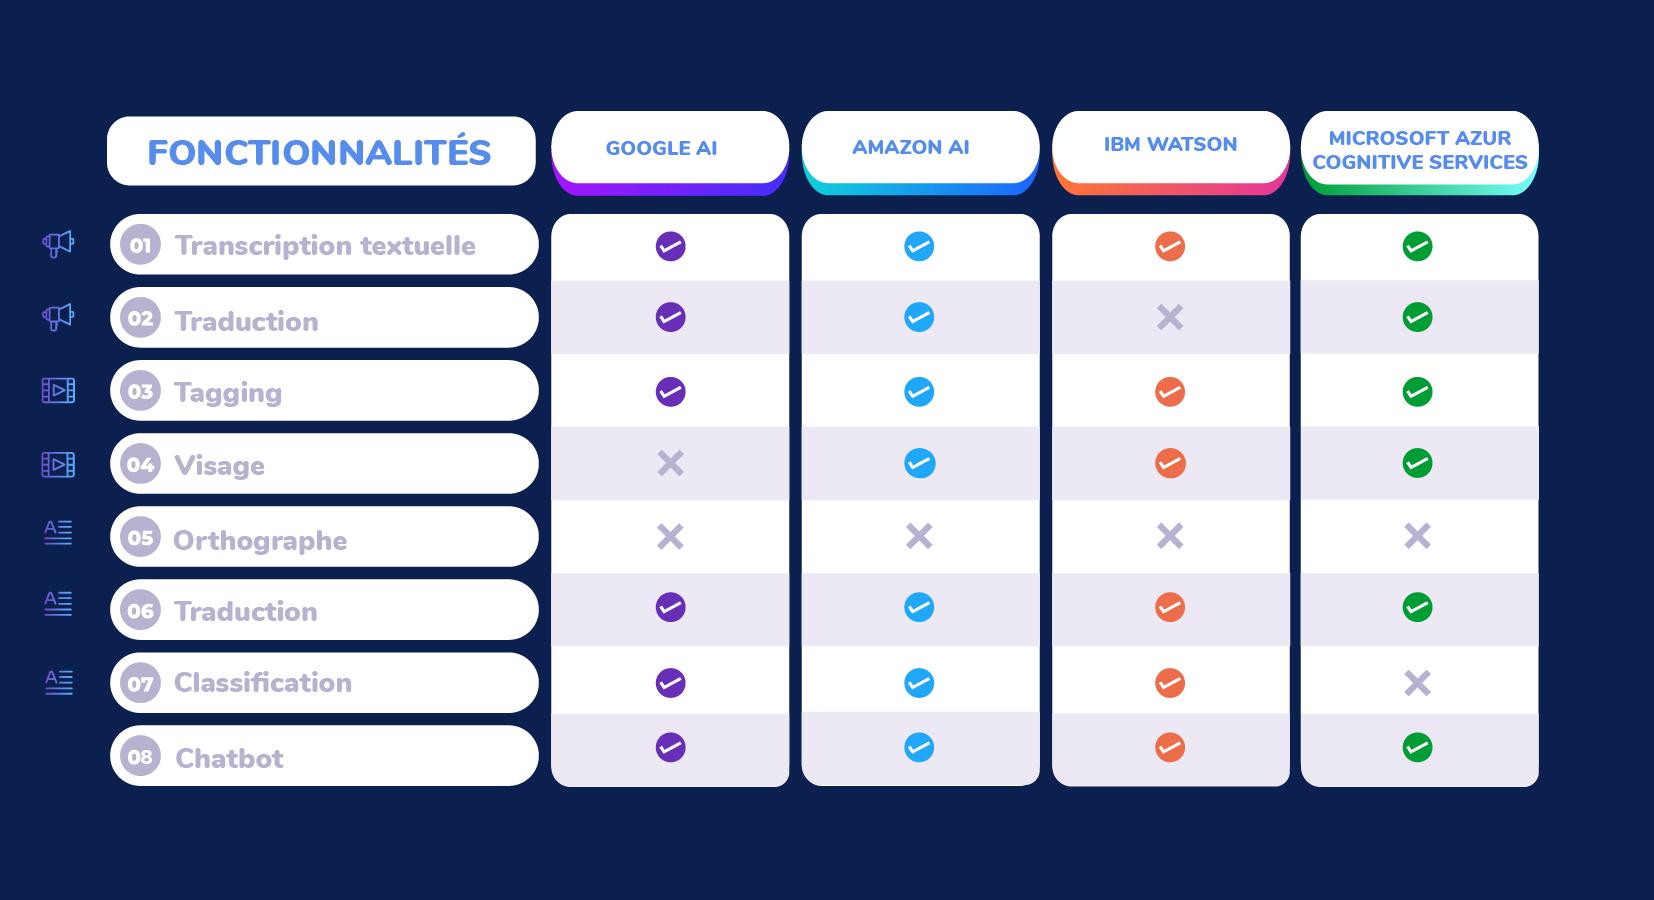 Benchmark des plateformes IA Google AI, Amazon AI, IBM Watson, Microsoft Azure Cognitive Services.